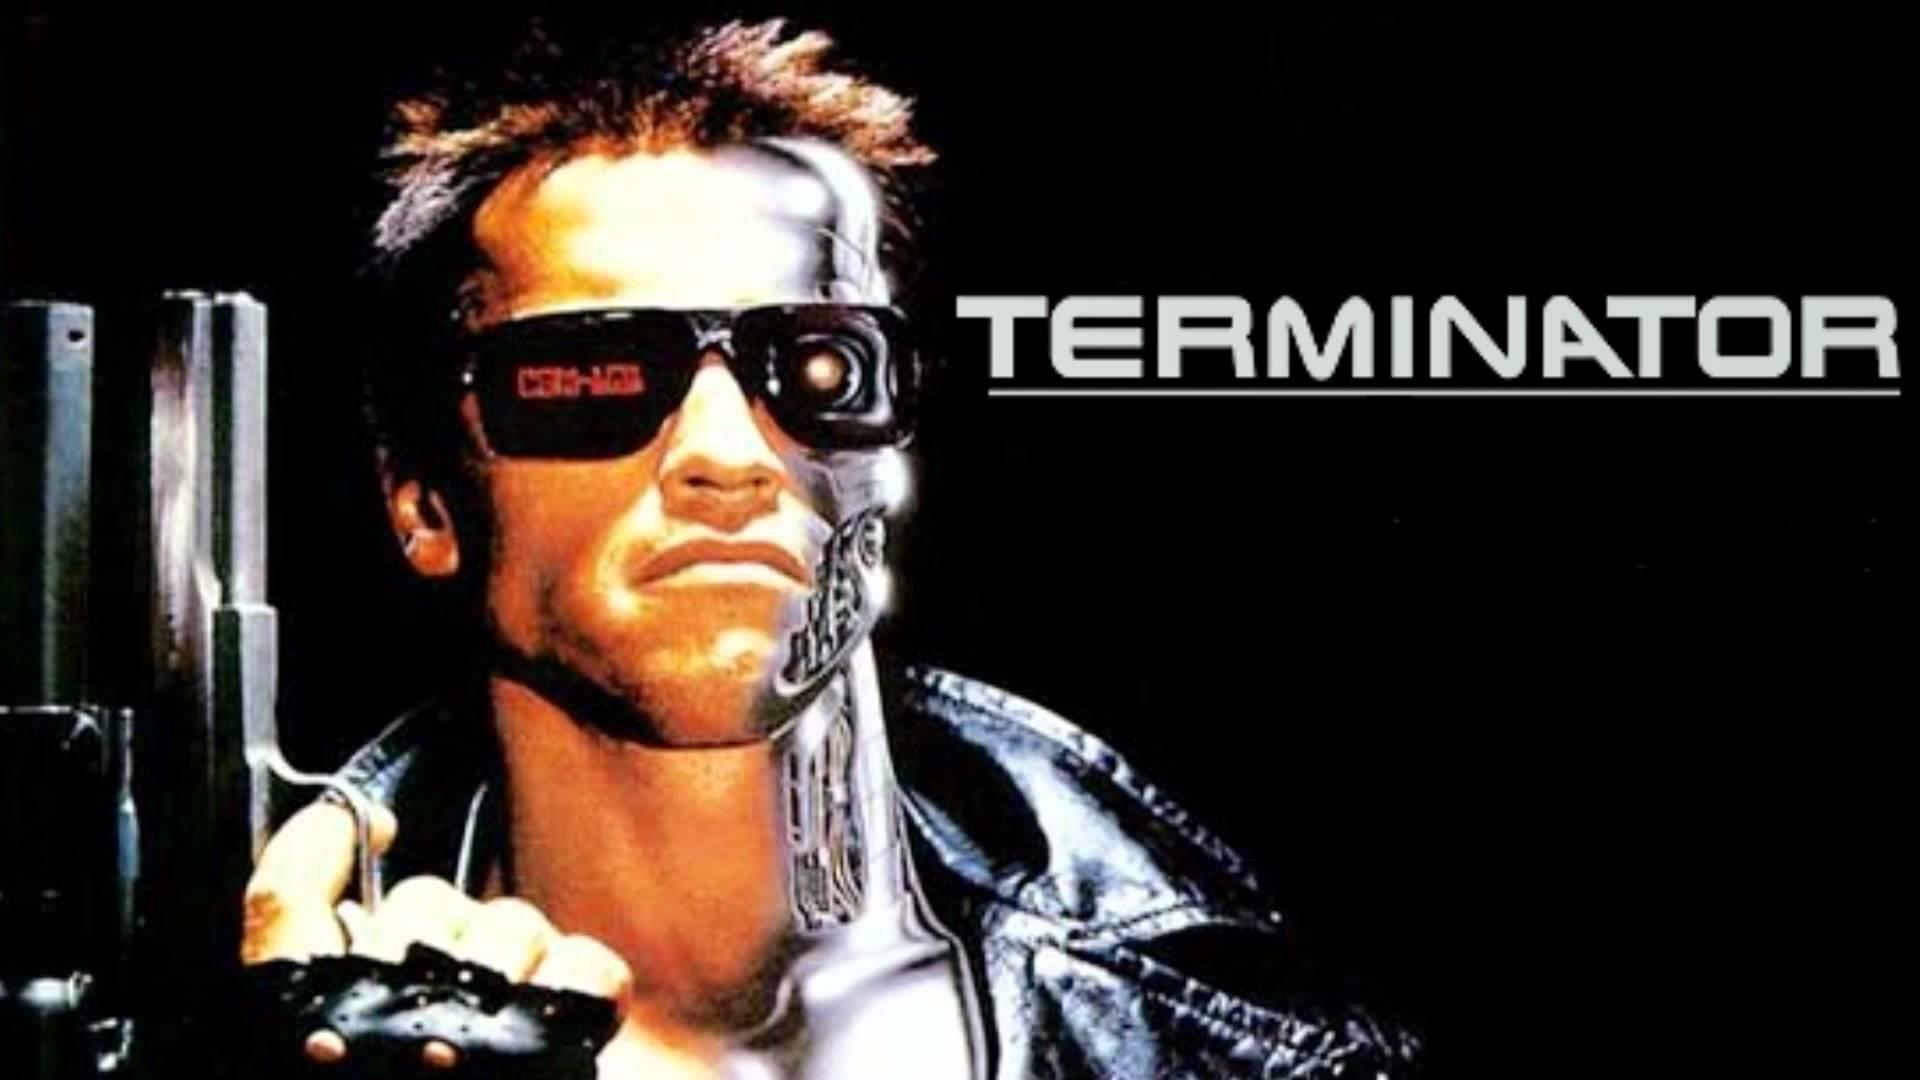 Terminator - Wallpaper